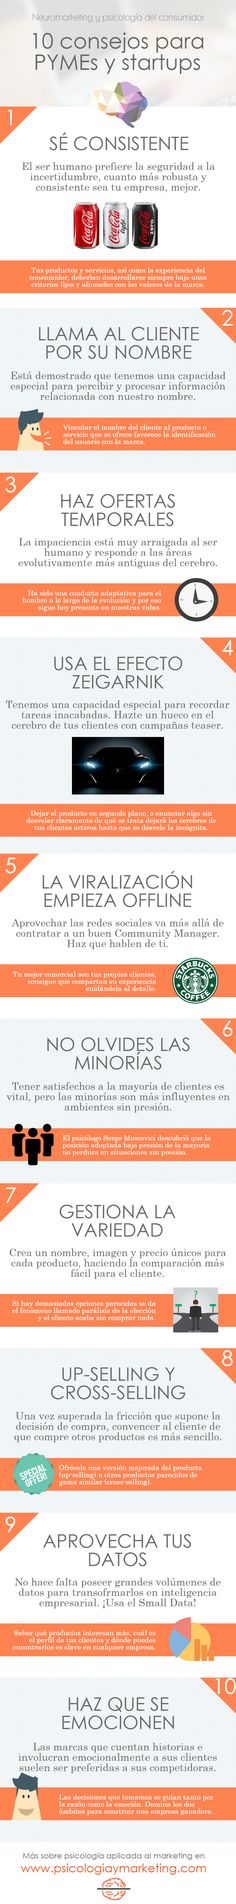 10-consejos-PYMEs-startups-infografia1.png (797×6433)